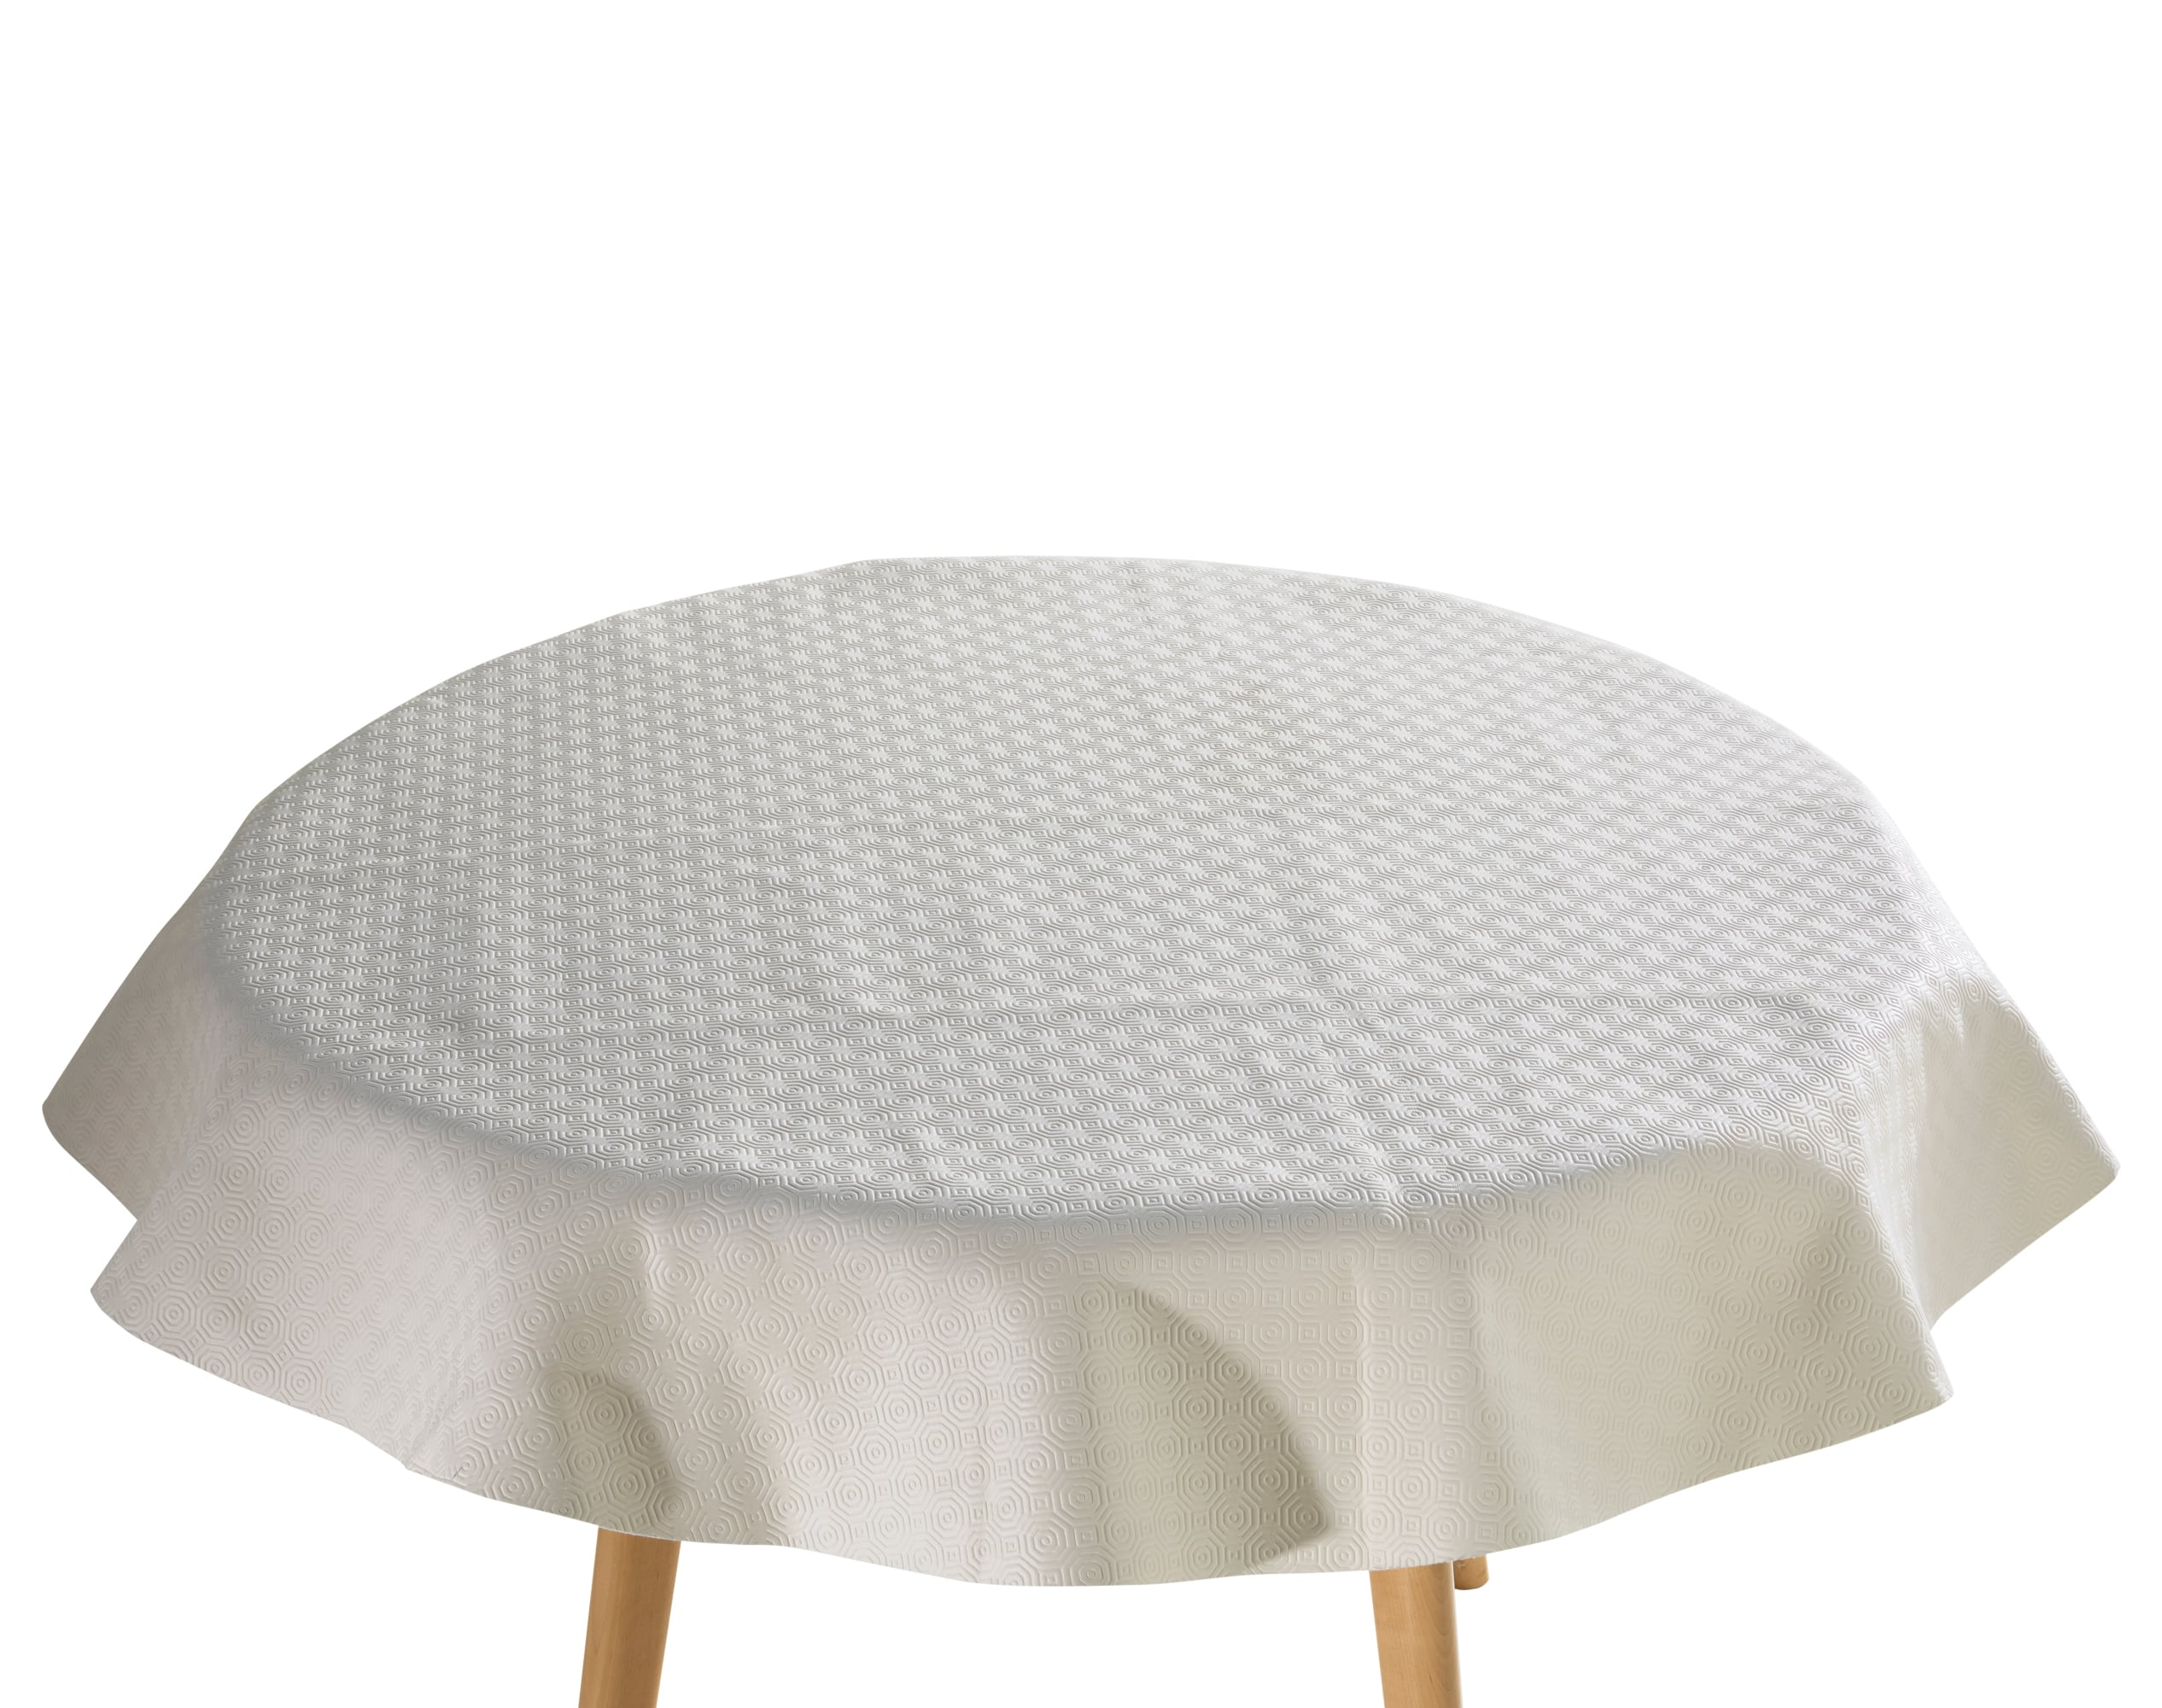 Protège-table standard rectangulaire blanc 105x220